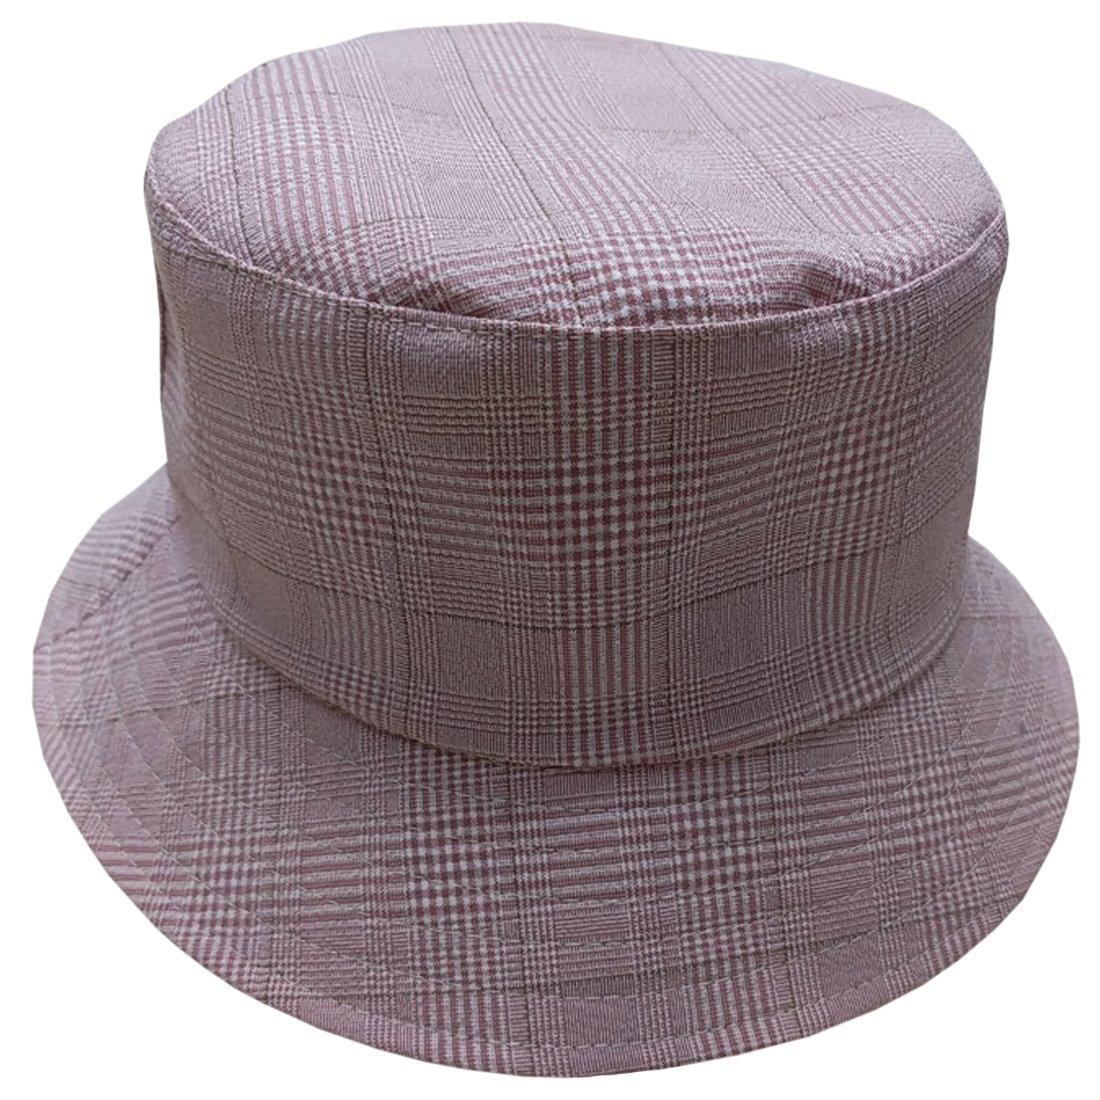 ACVIP Womens Banana Flamingo Print Fishing Bucket Hat Cap Packable